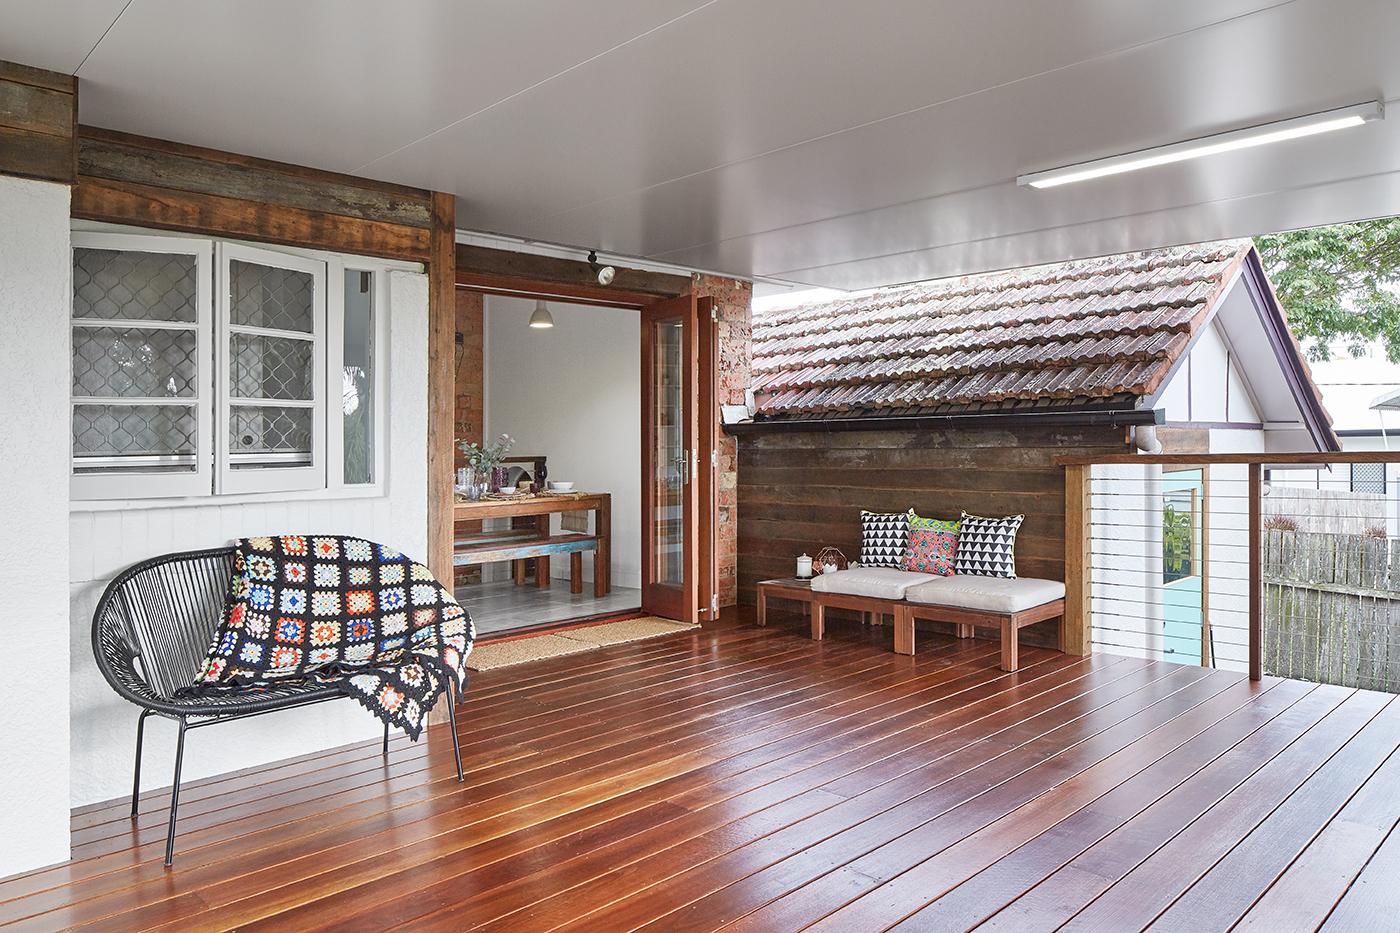 deck view with wood floor